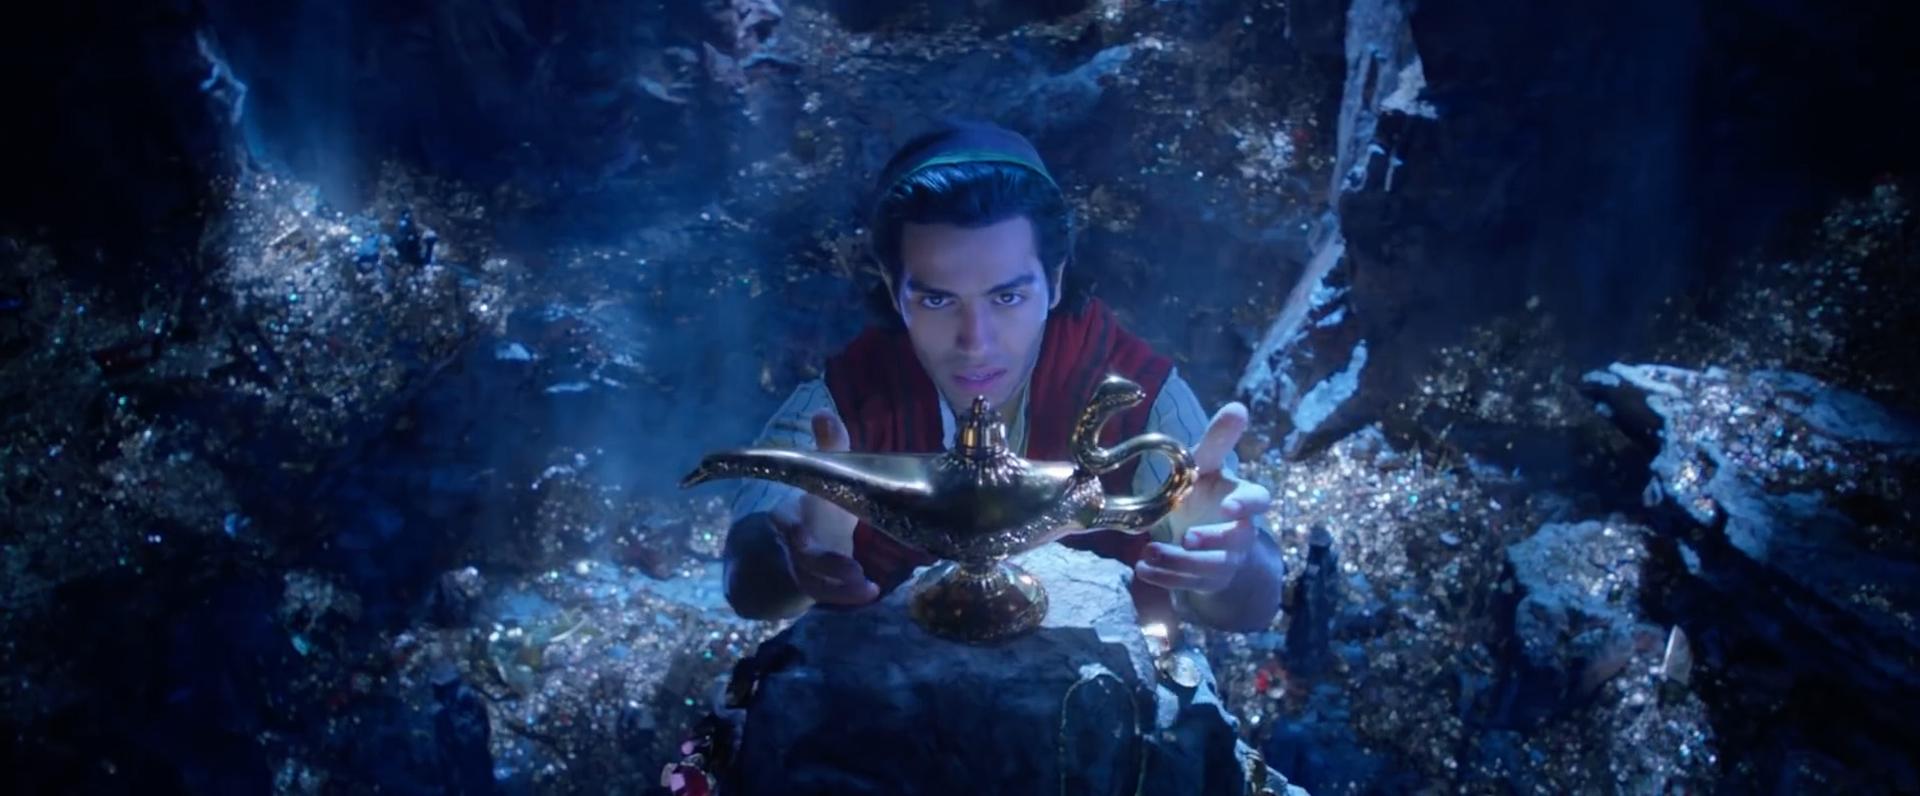 Aladdin_teaser_trailer